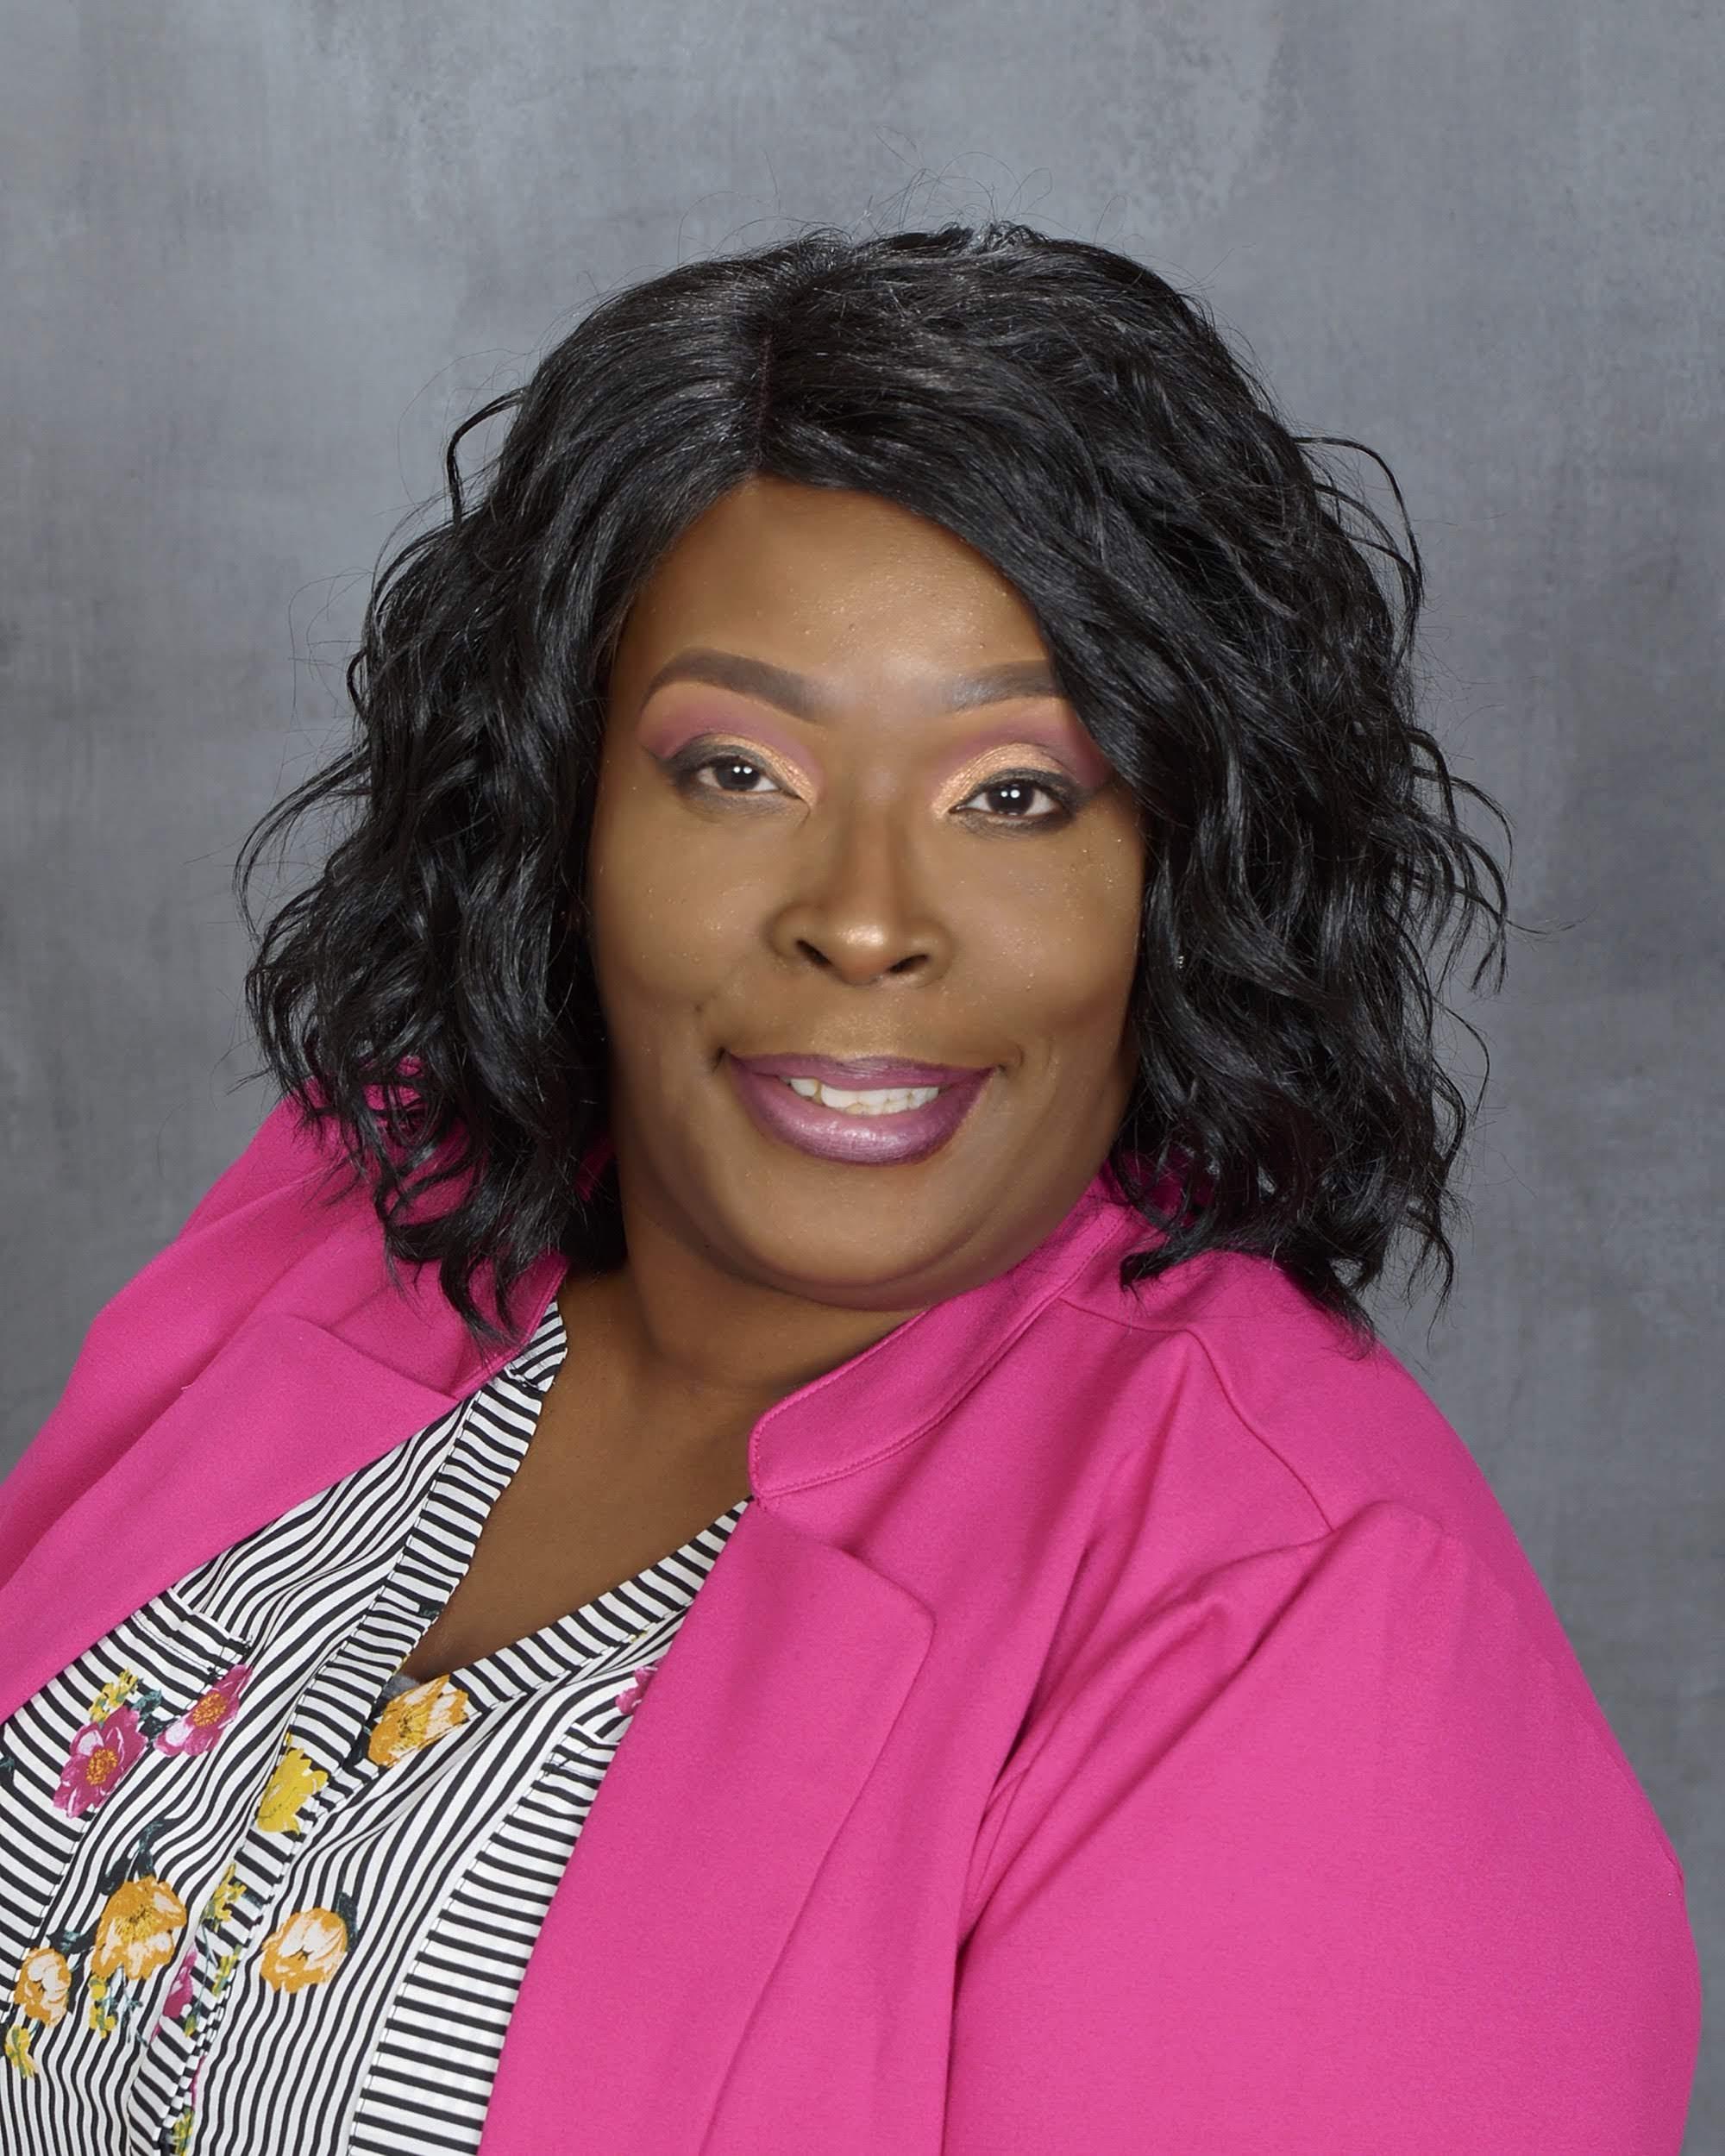 Kenyatta Sinclair. Photo courtesy of the Greater Milwaukee Foundation.